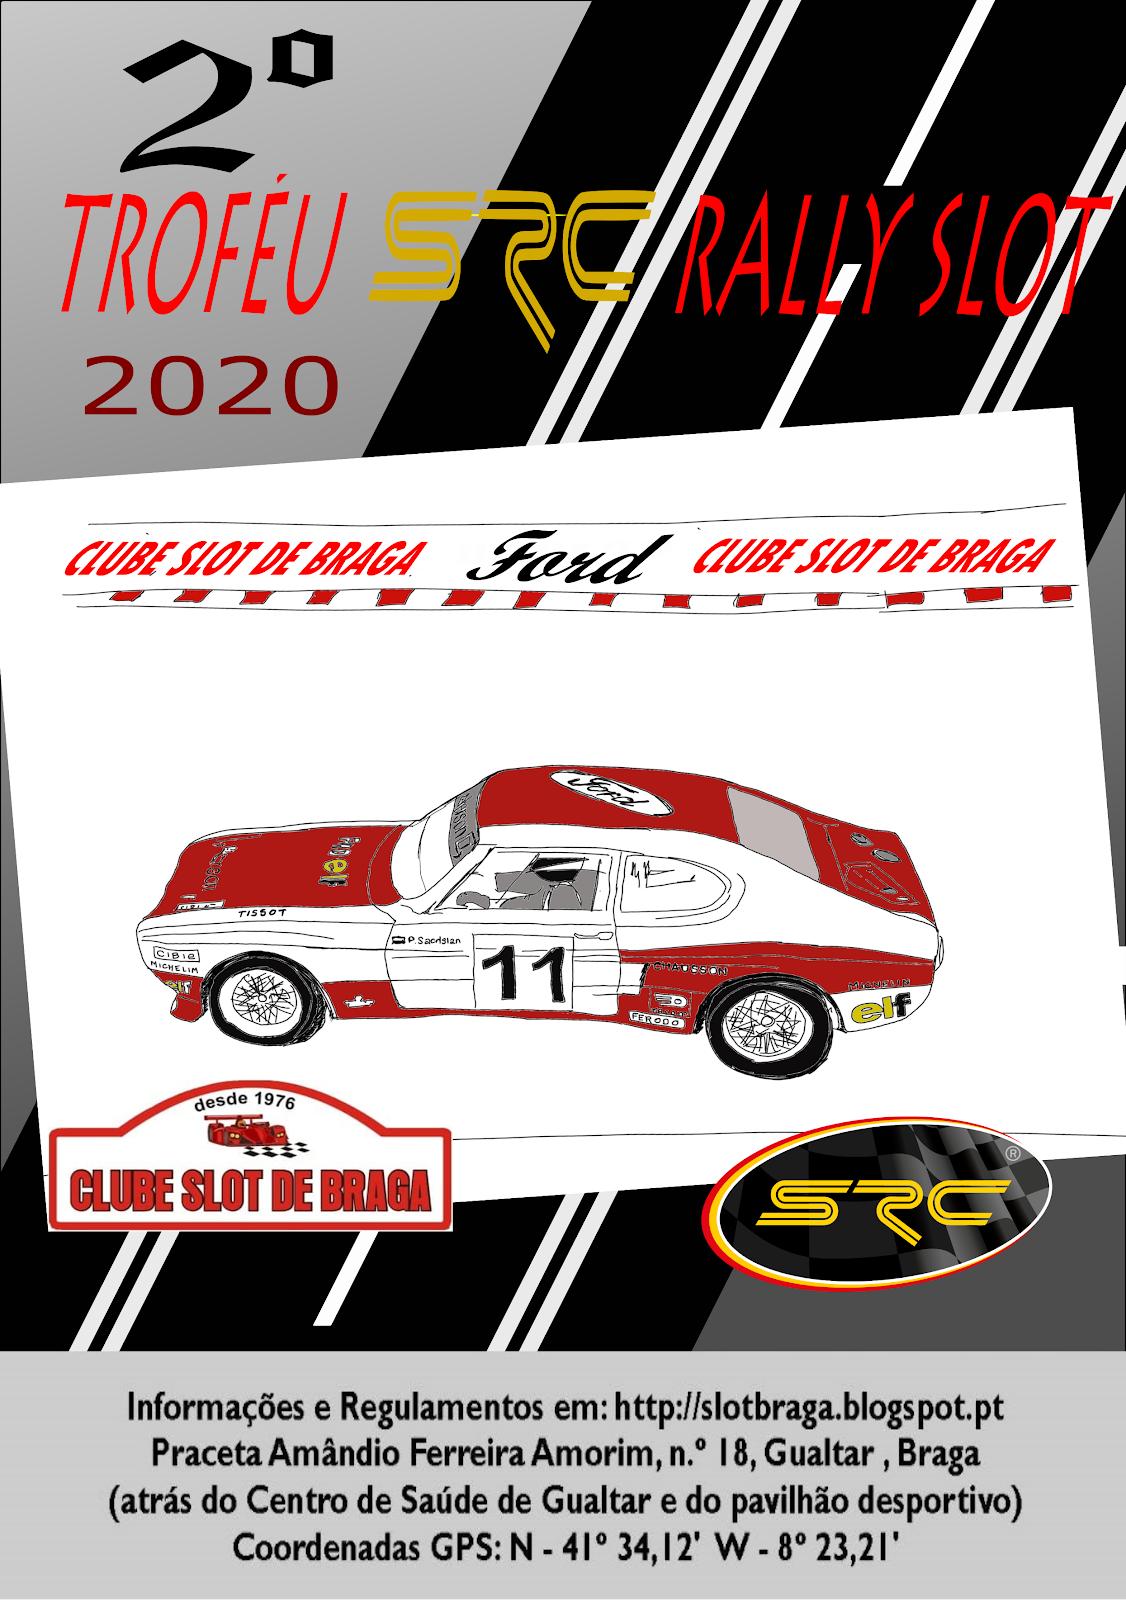 2.º Troféu SRC Rally Slot 2020